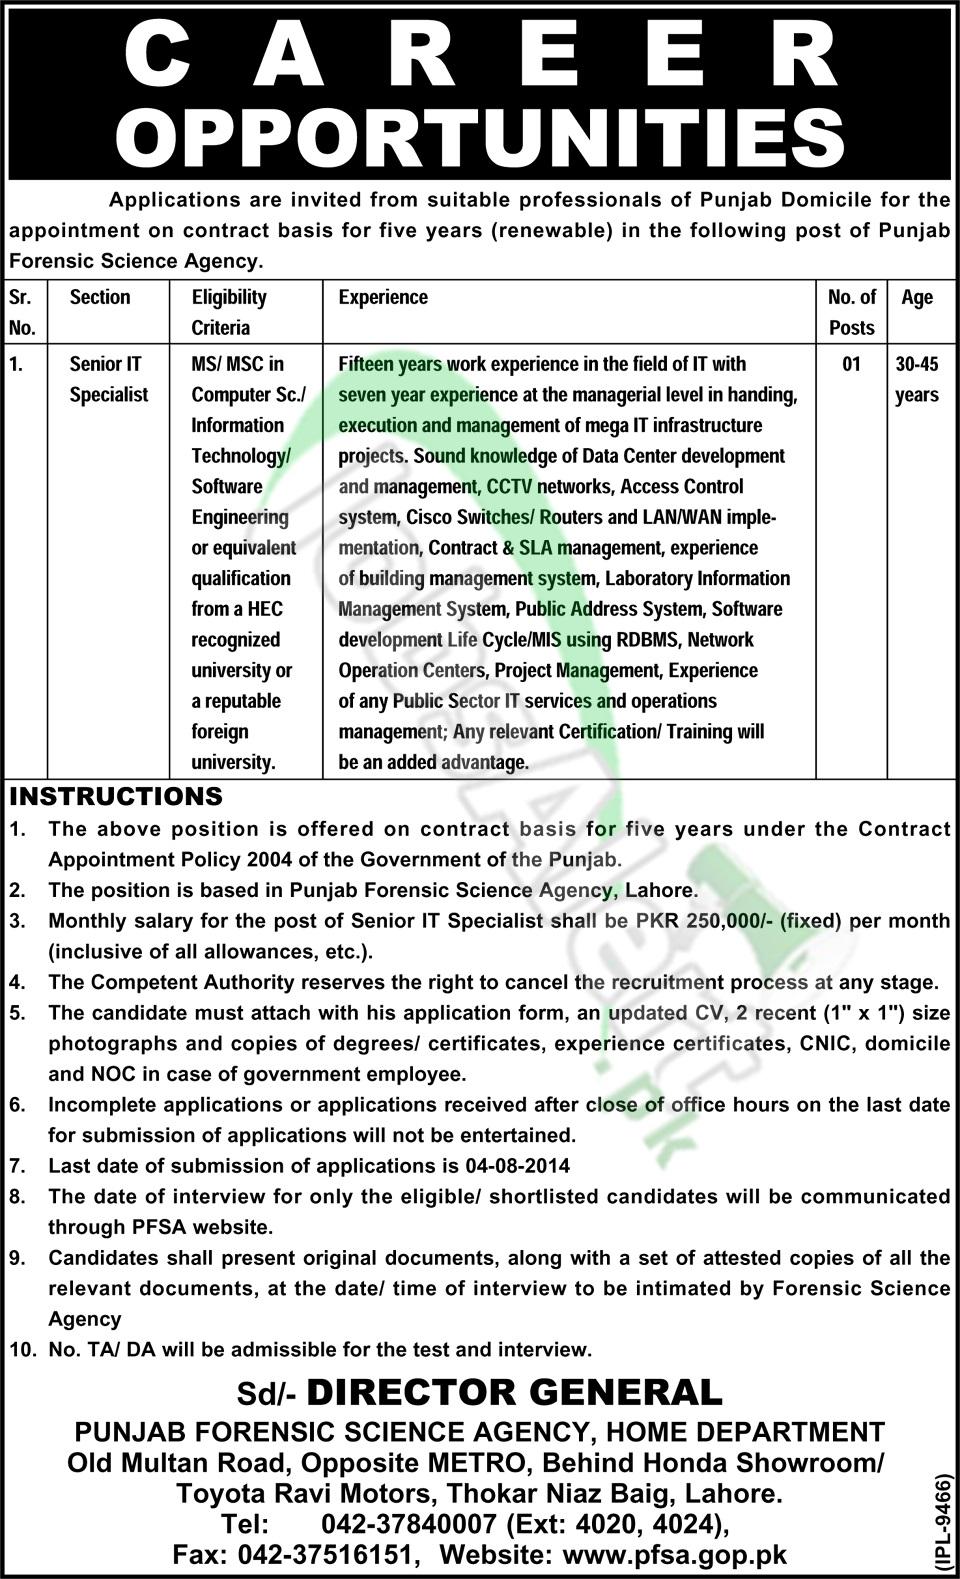 Punjab Forensic Science Agency (PFSA) Lahore